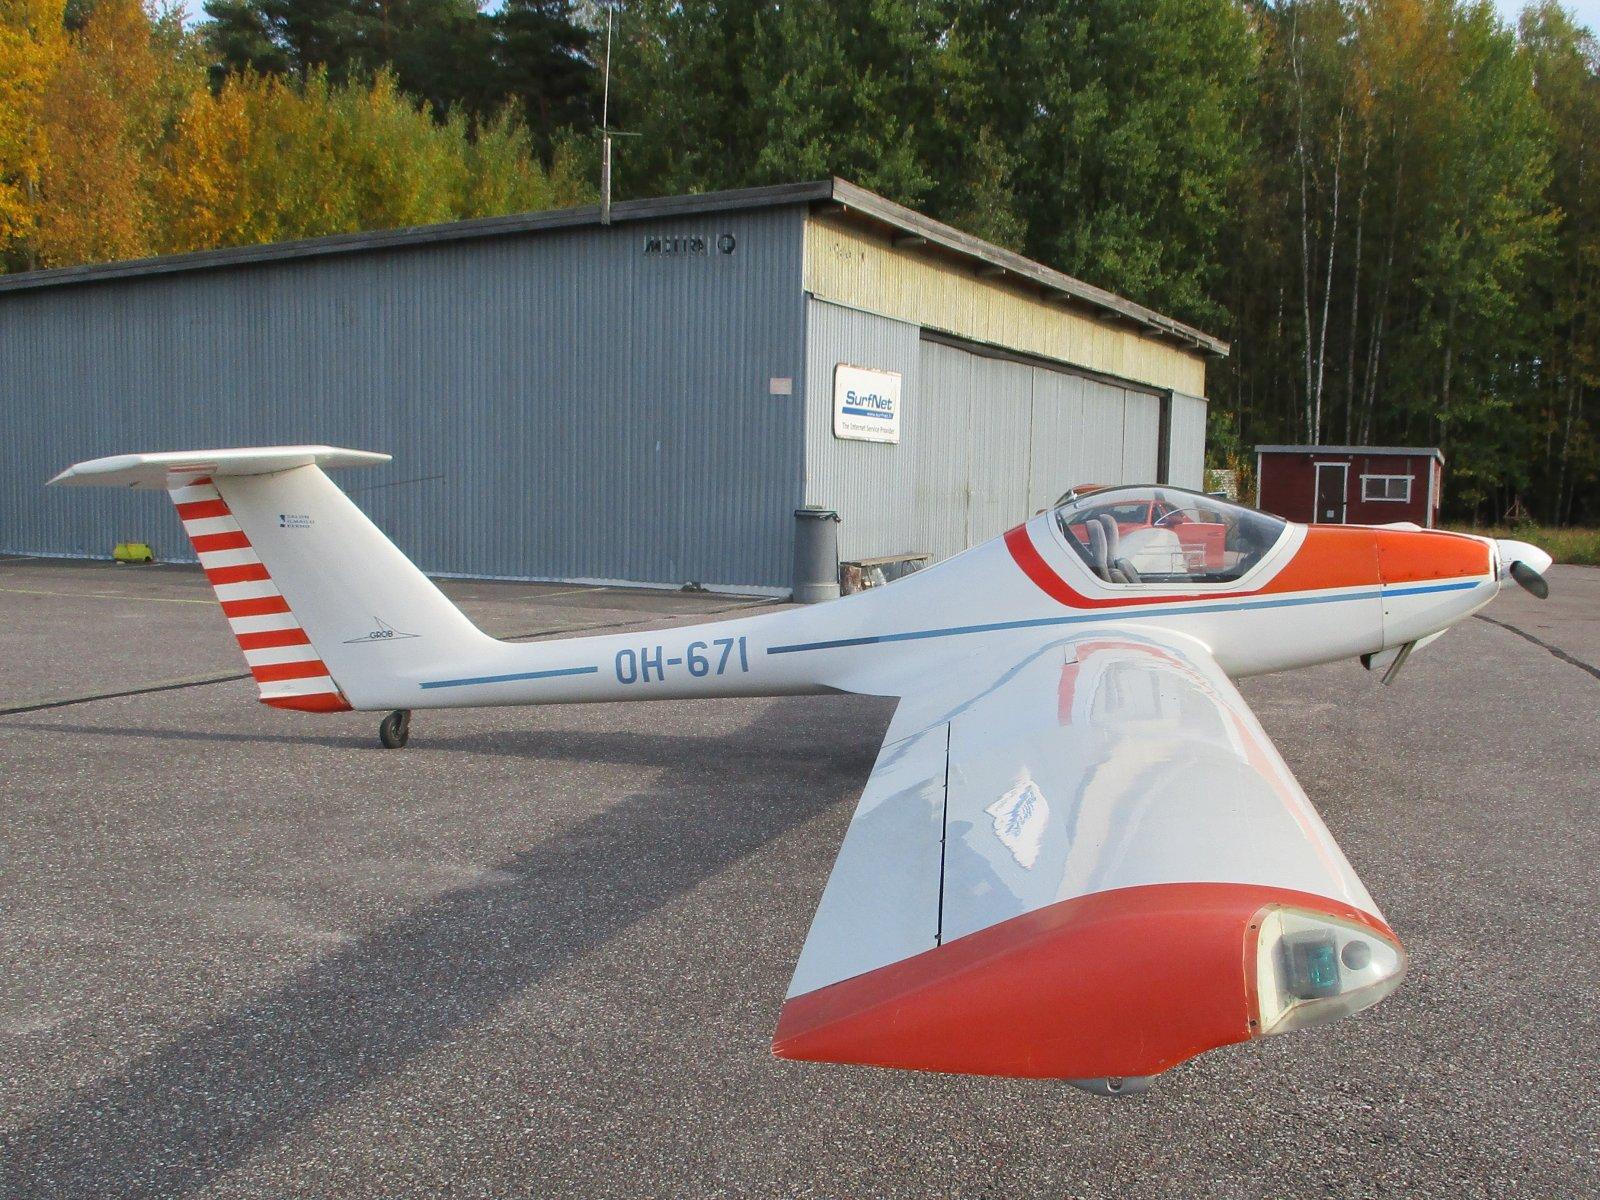 Grob G.109 OH-671 EFHN2019-10-05.